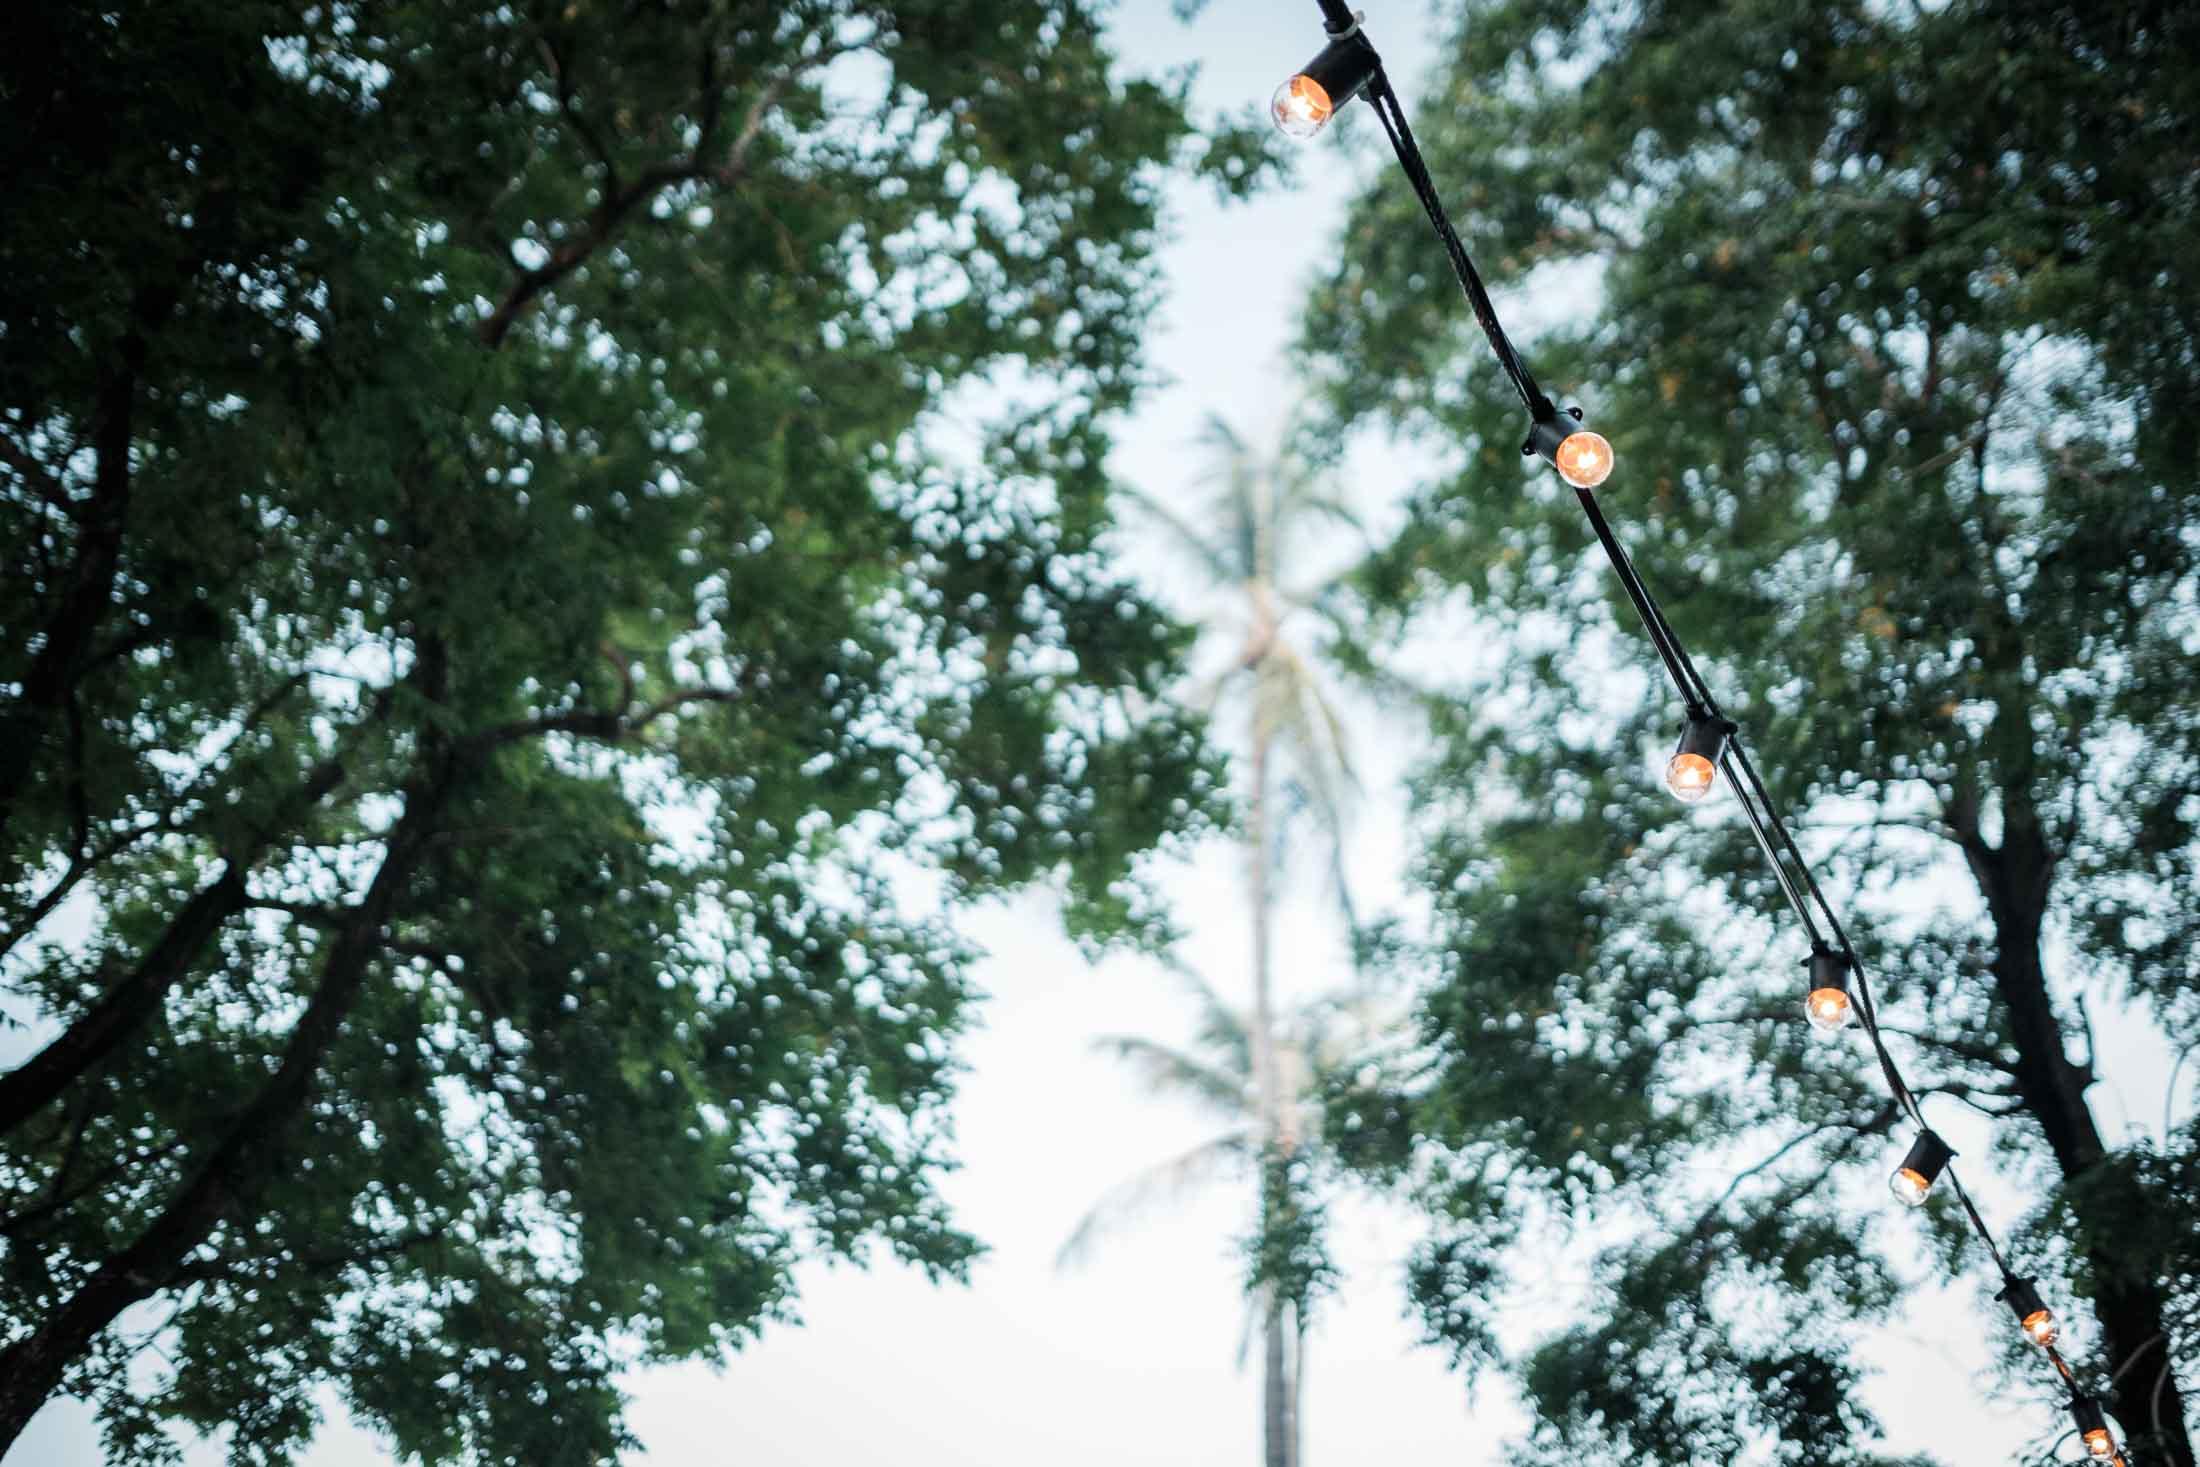 Photographe Mariage Thailande tropical guirlandes